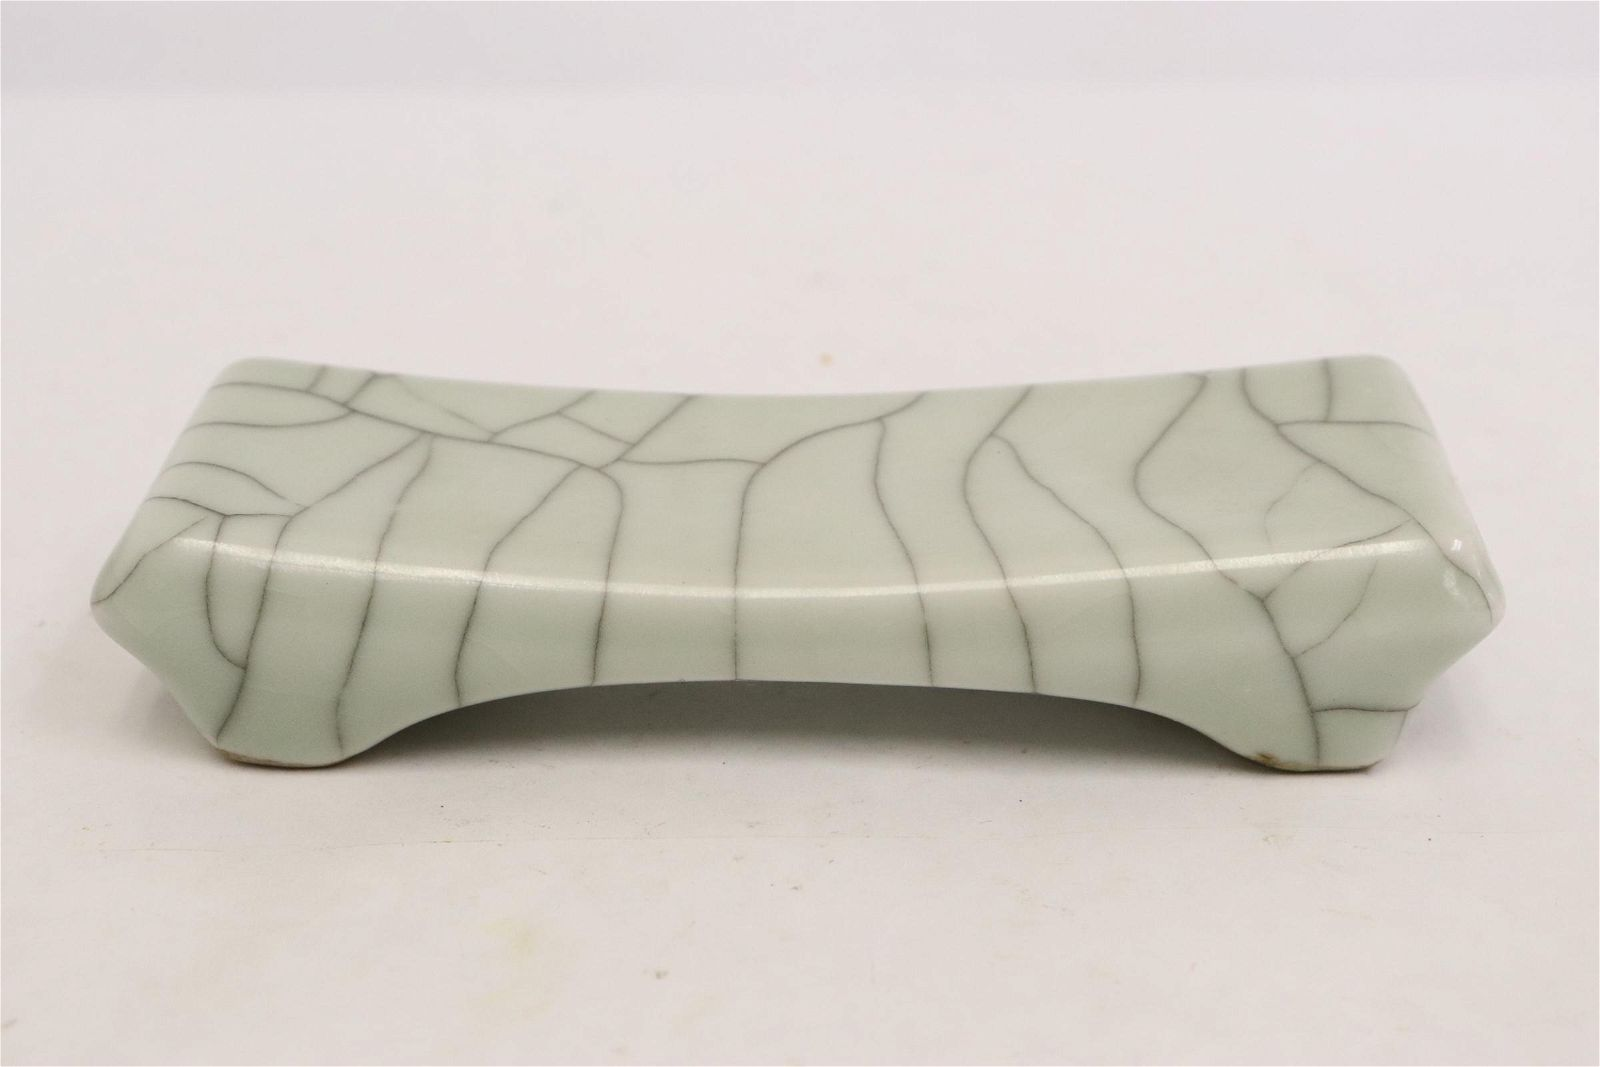 Chinese vintage crackleware porcelain brush stand